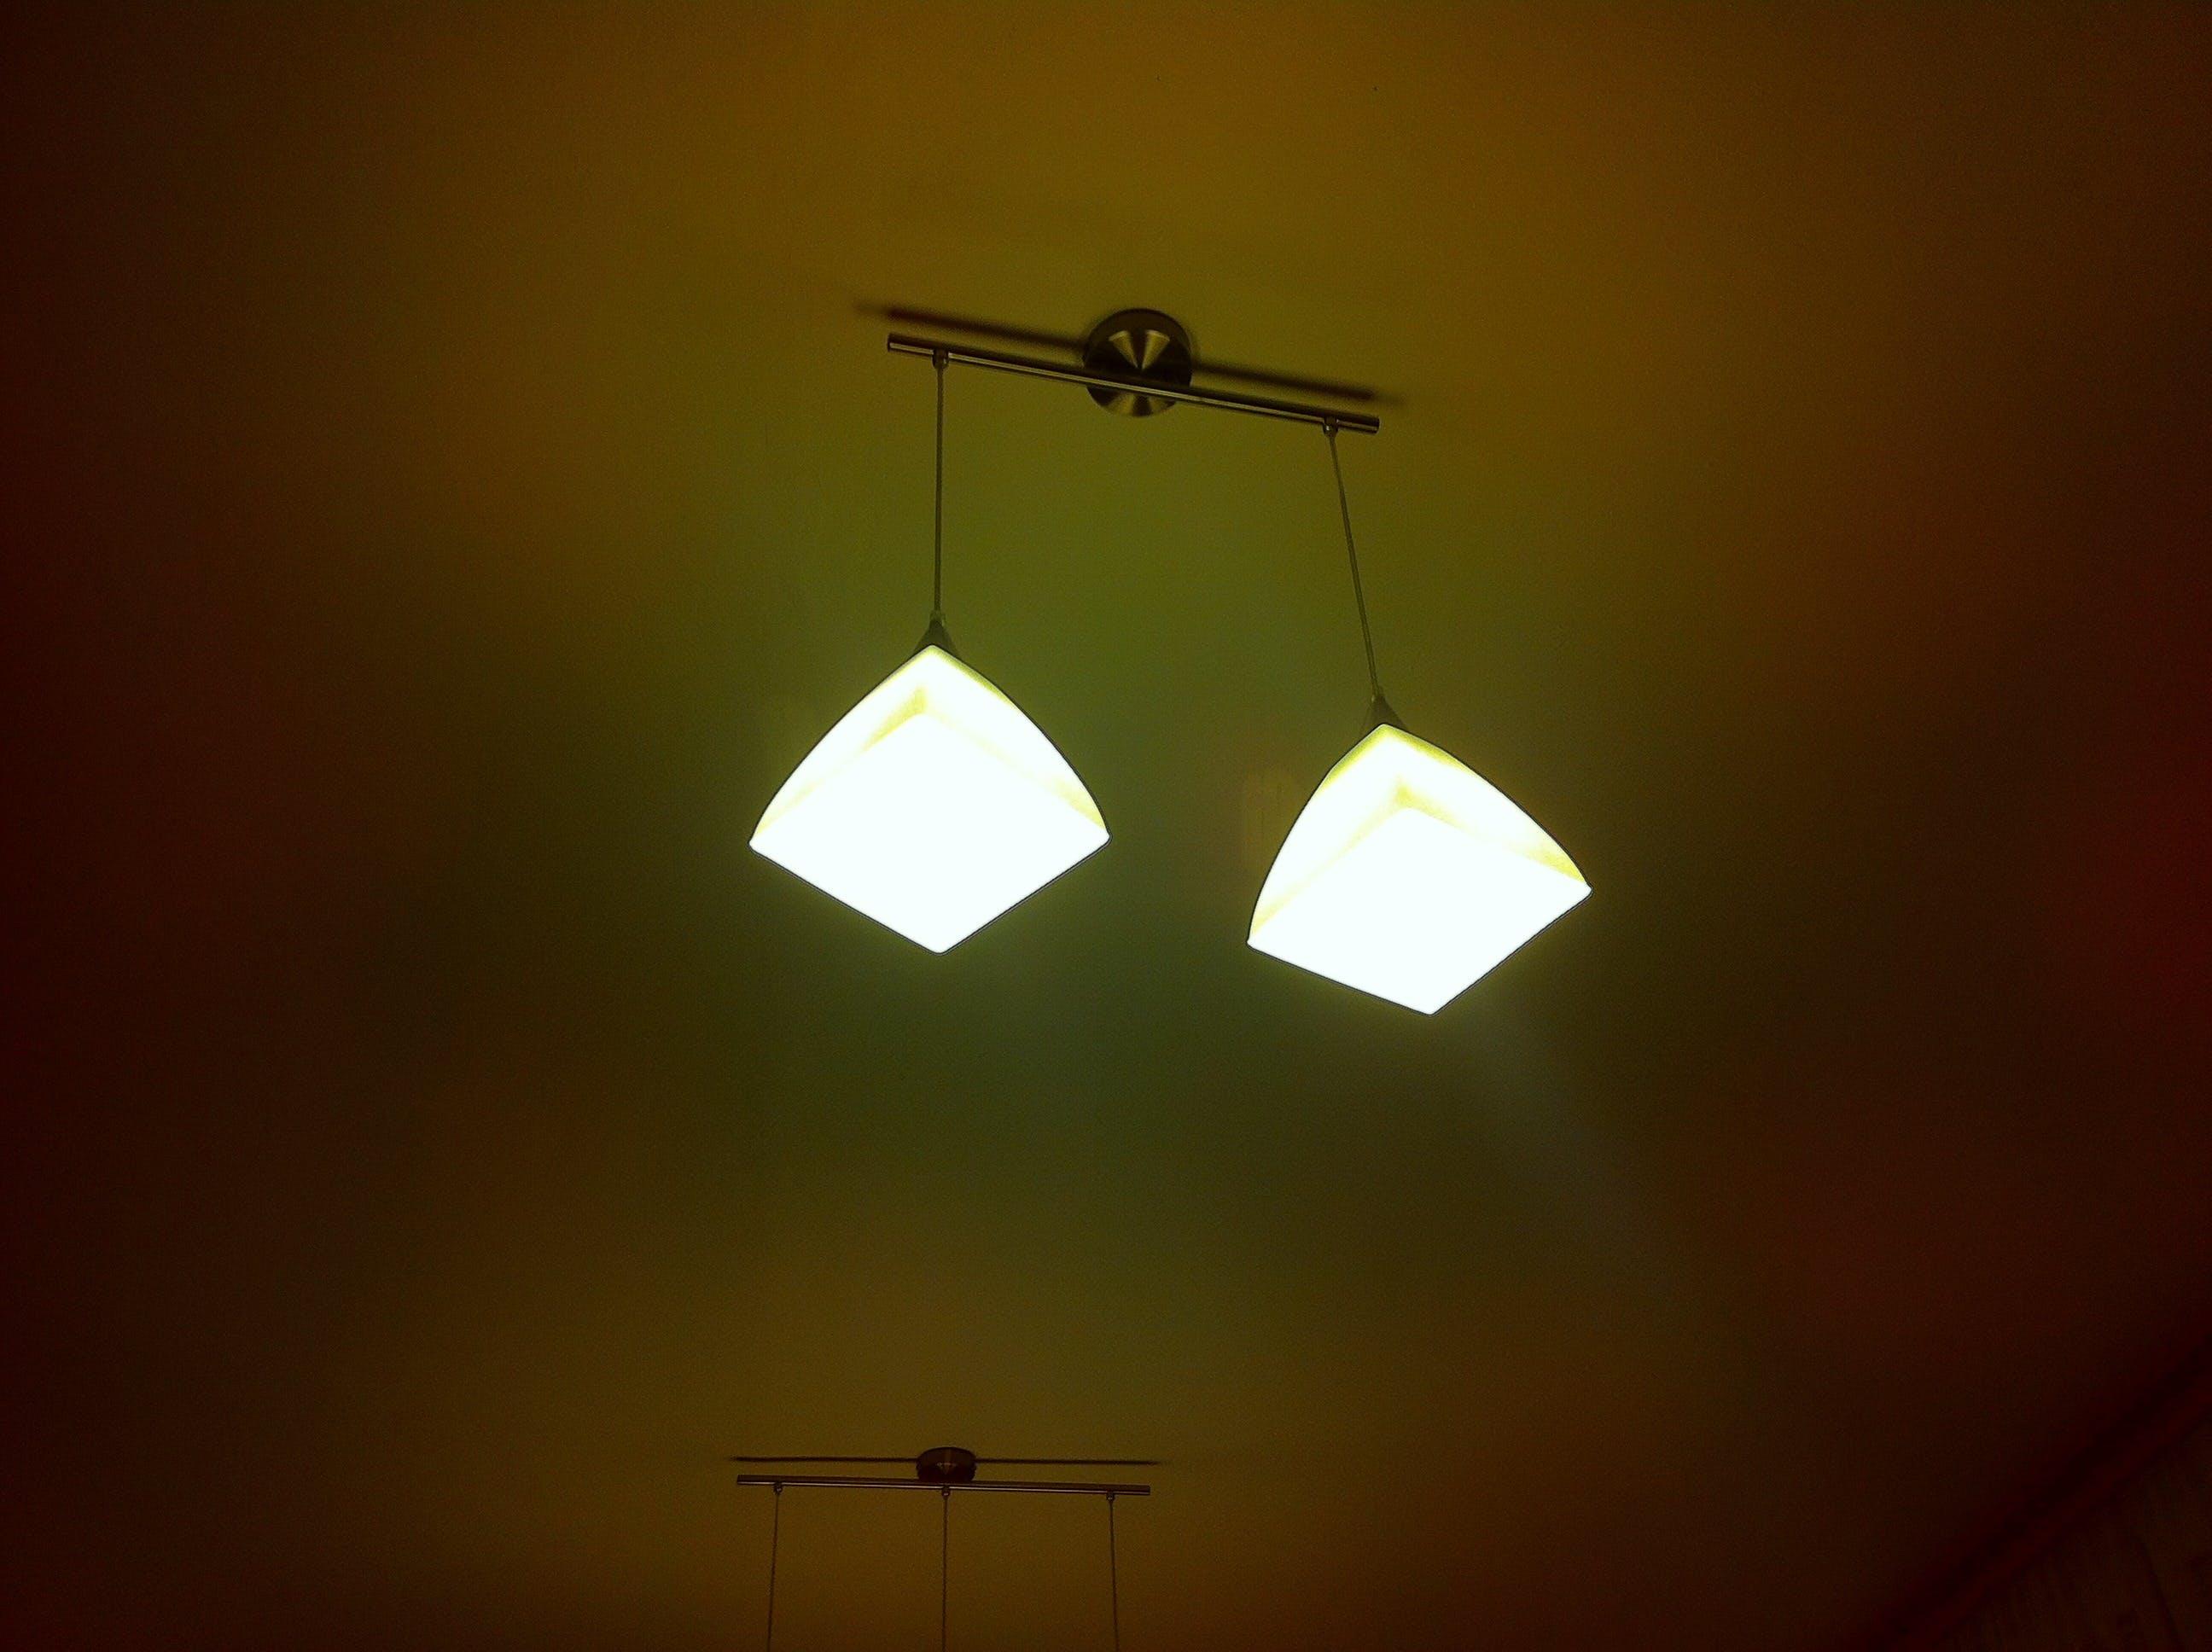 Free stock photo of lamp, lamps, light, lighting